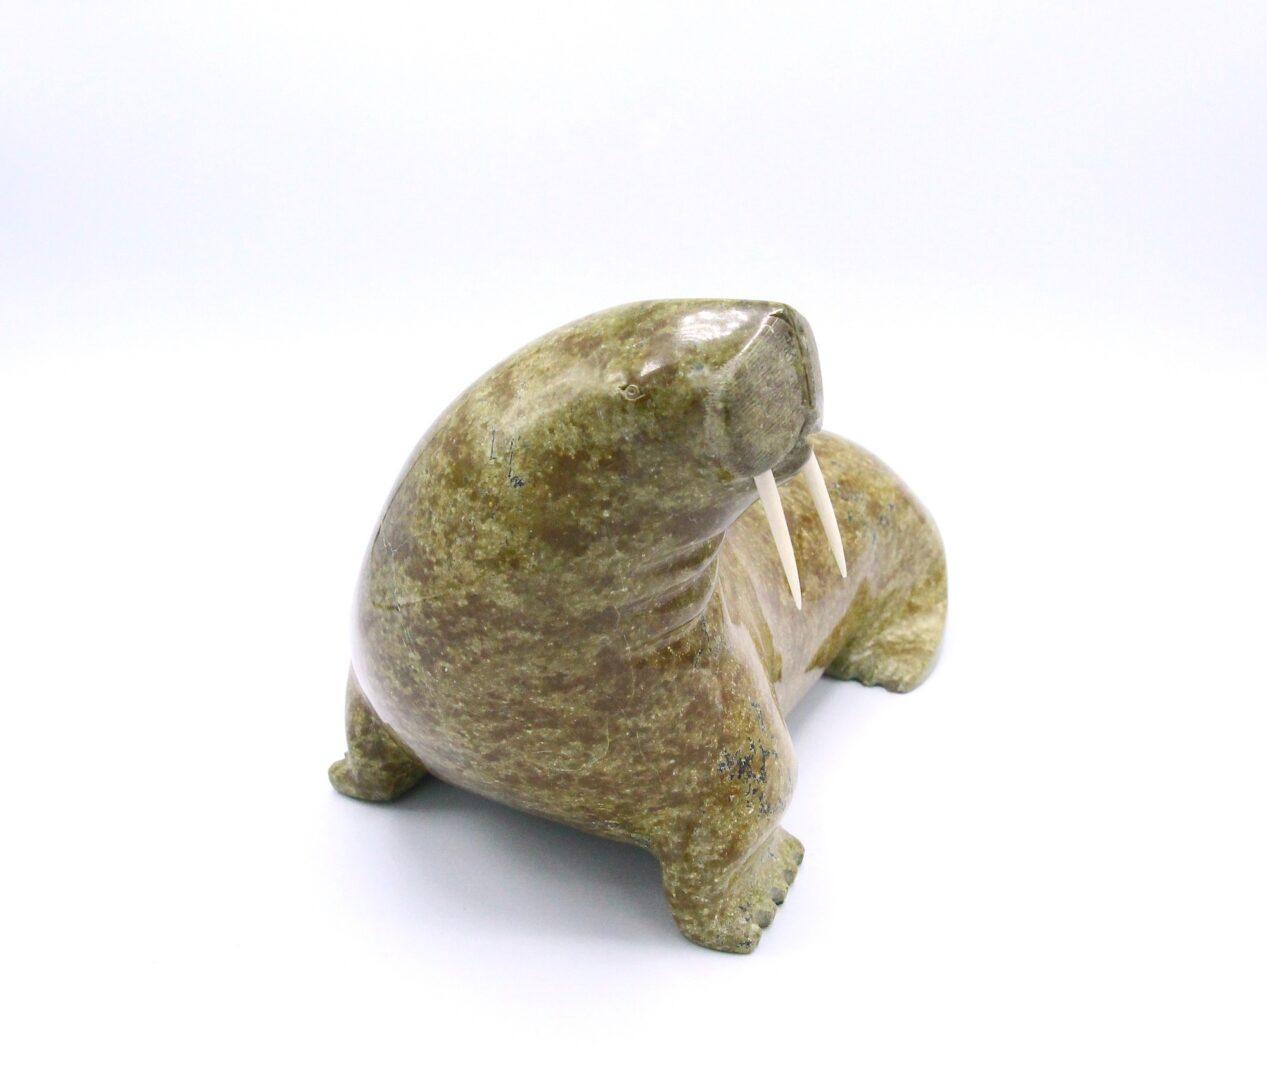 walrus Inuit Art Sculpture in Serpentine